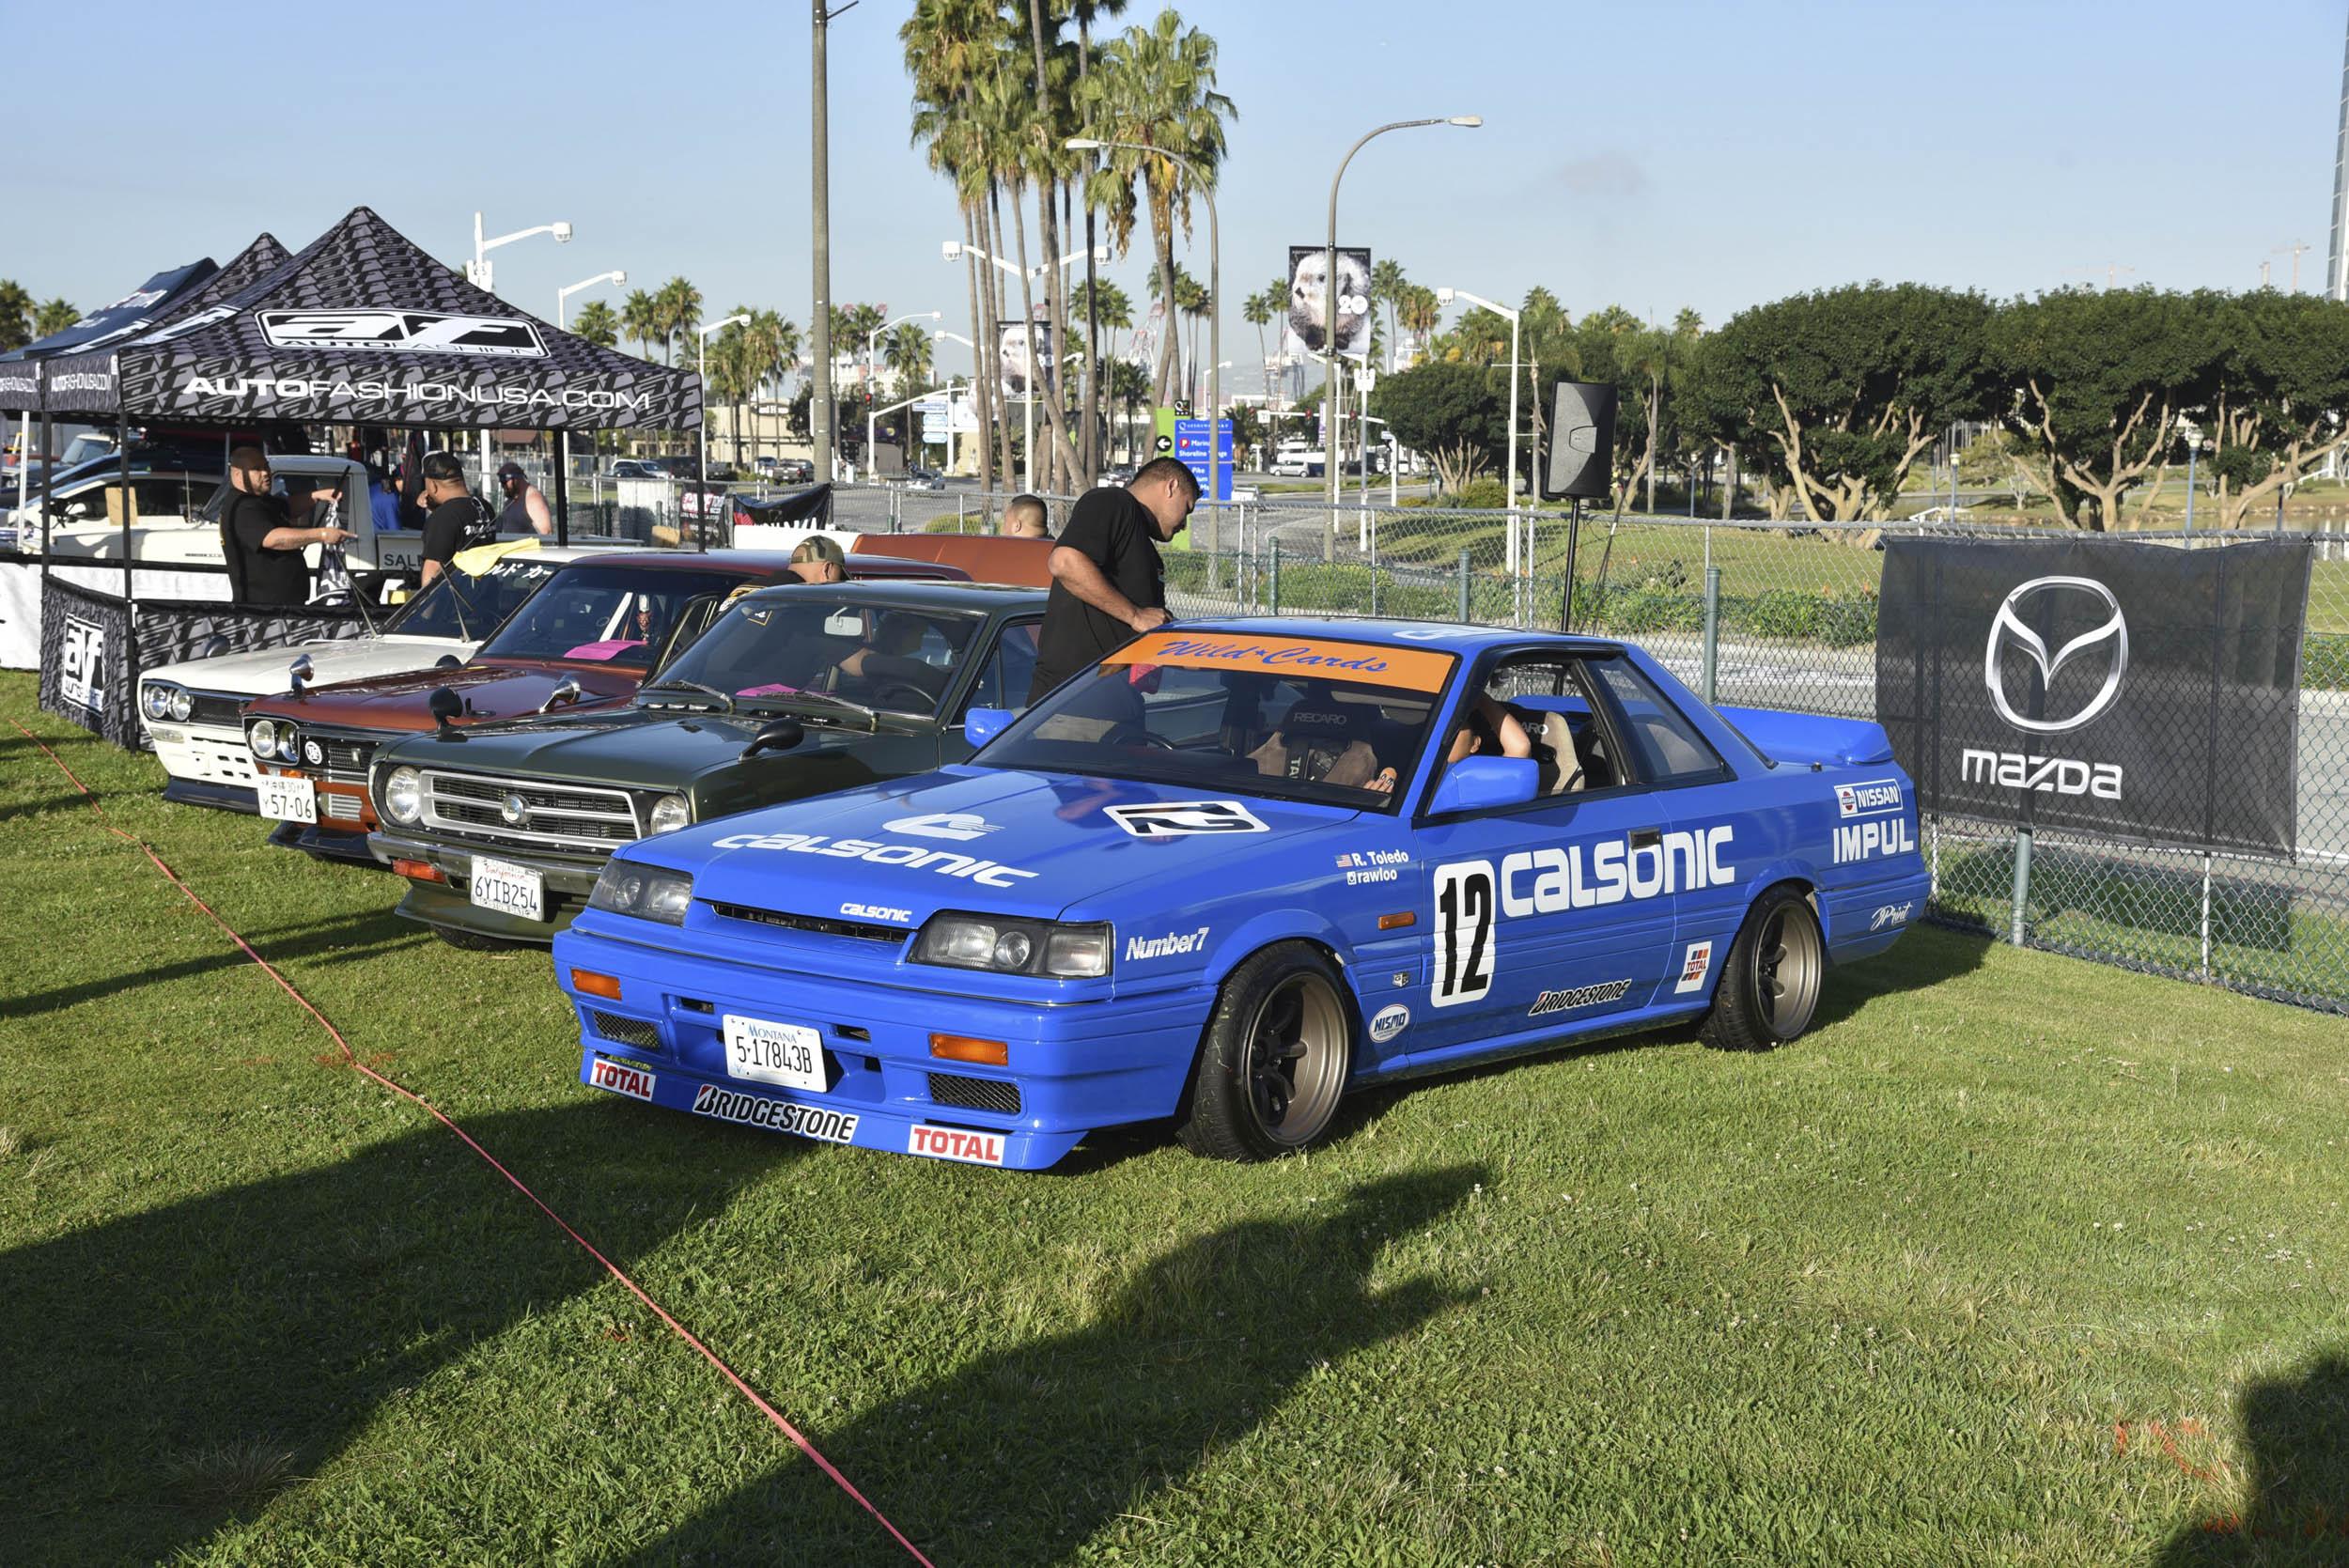 The Japanese Classic Car Show thrives, despite California ...